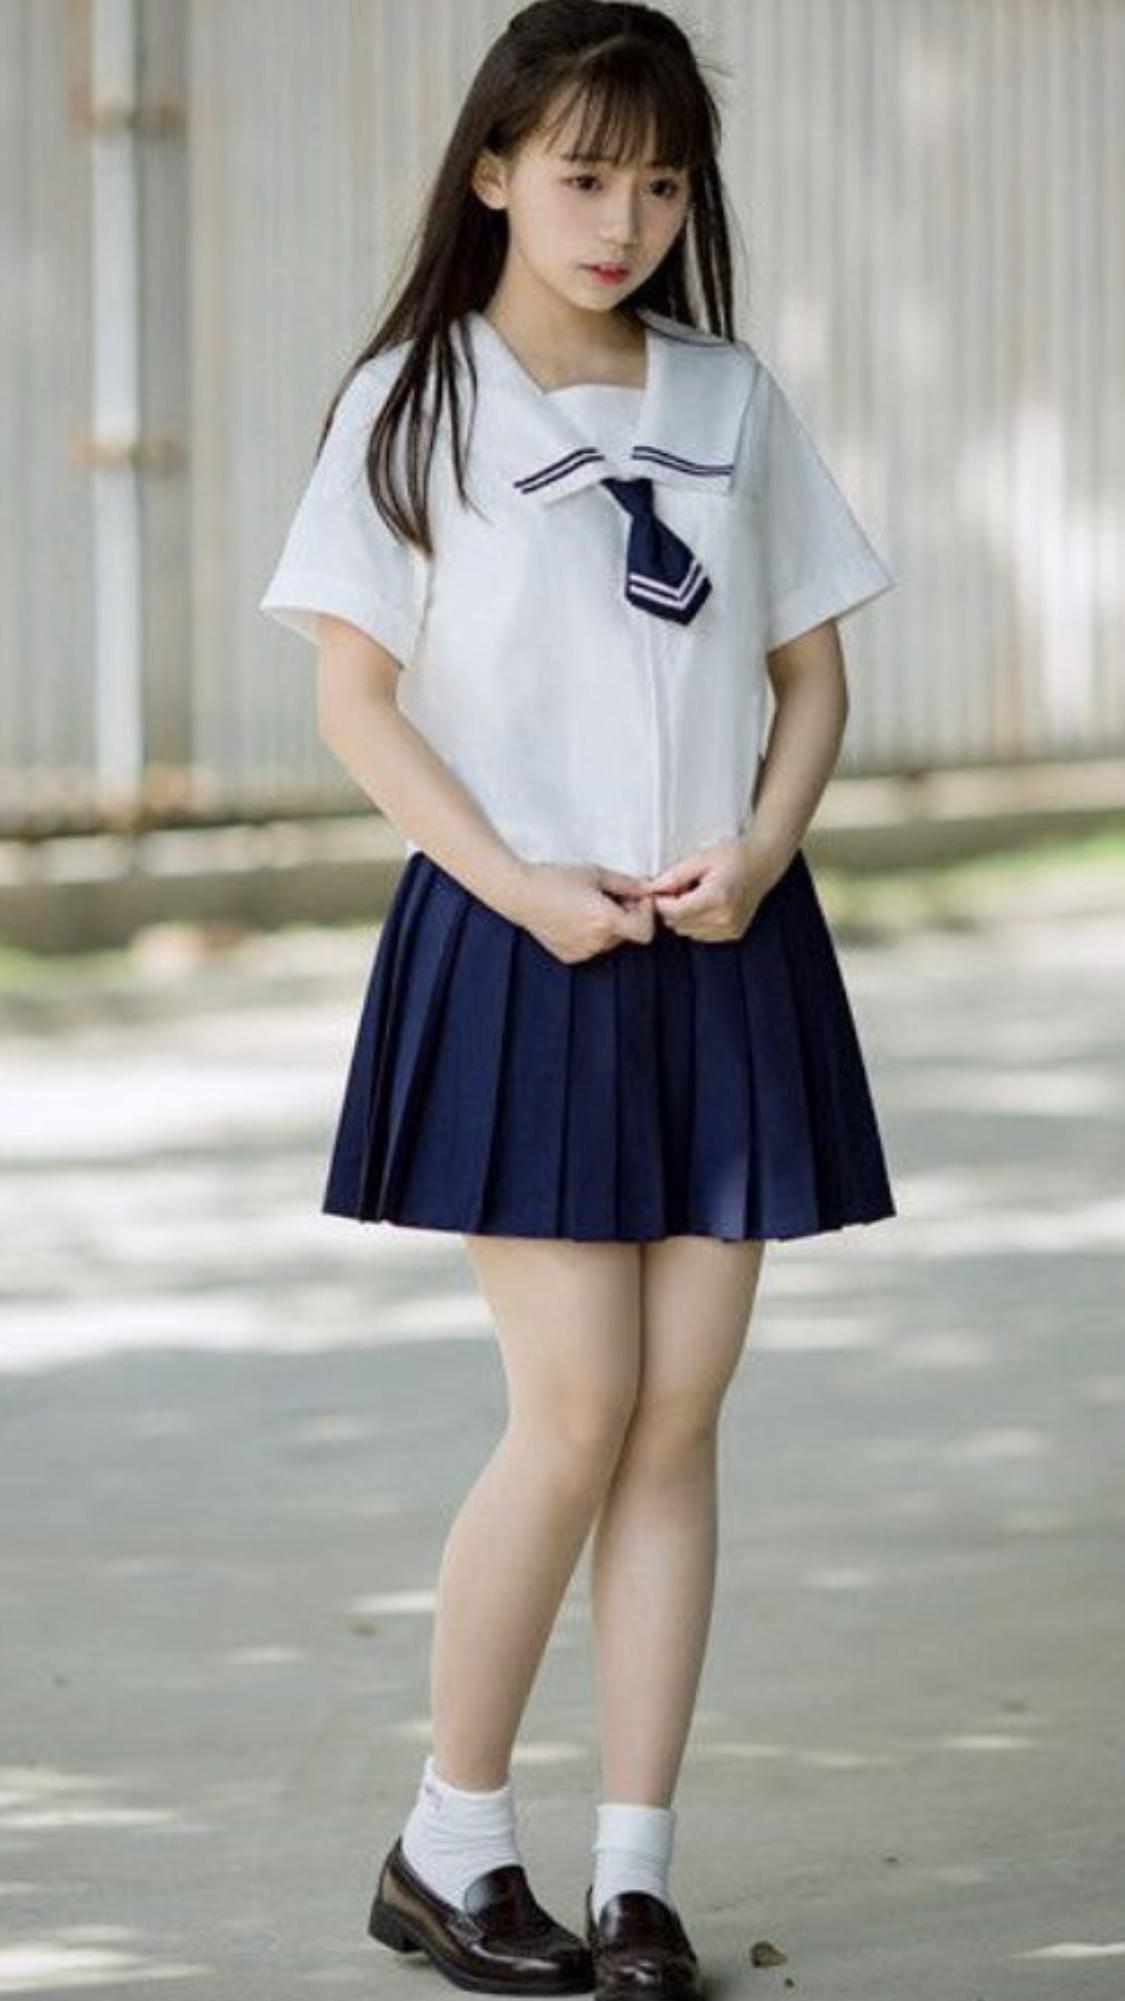 Pretty Japanese Schoolgirl | Good Asian Girl